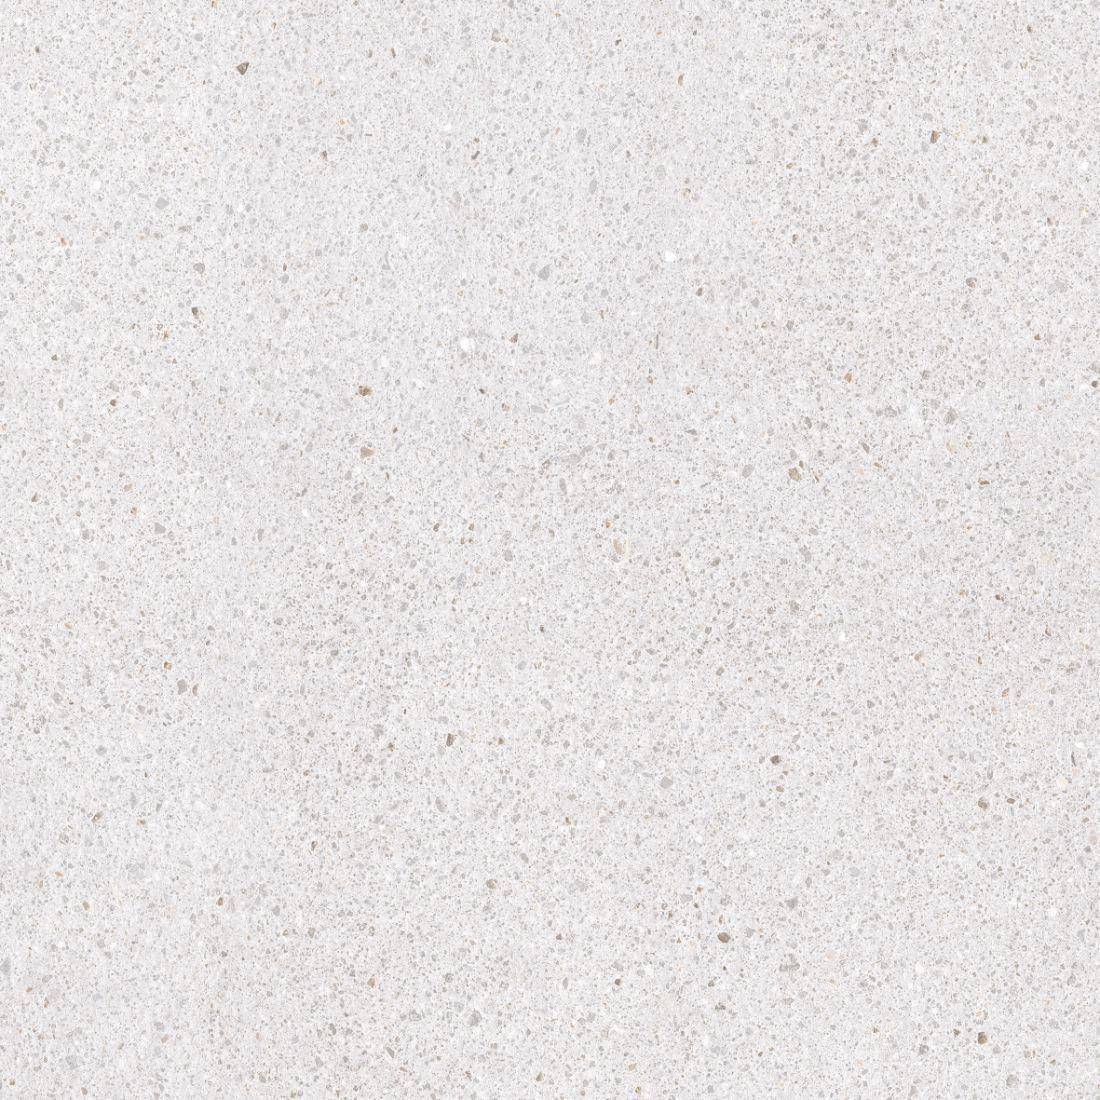 Quarrazzo Porcelain Tile Ice Snow 600 x 600 x 20mm